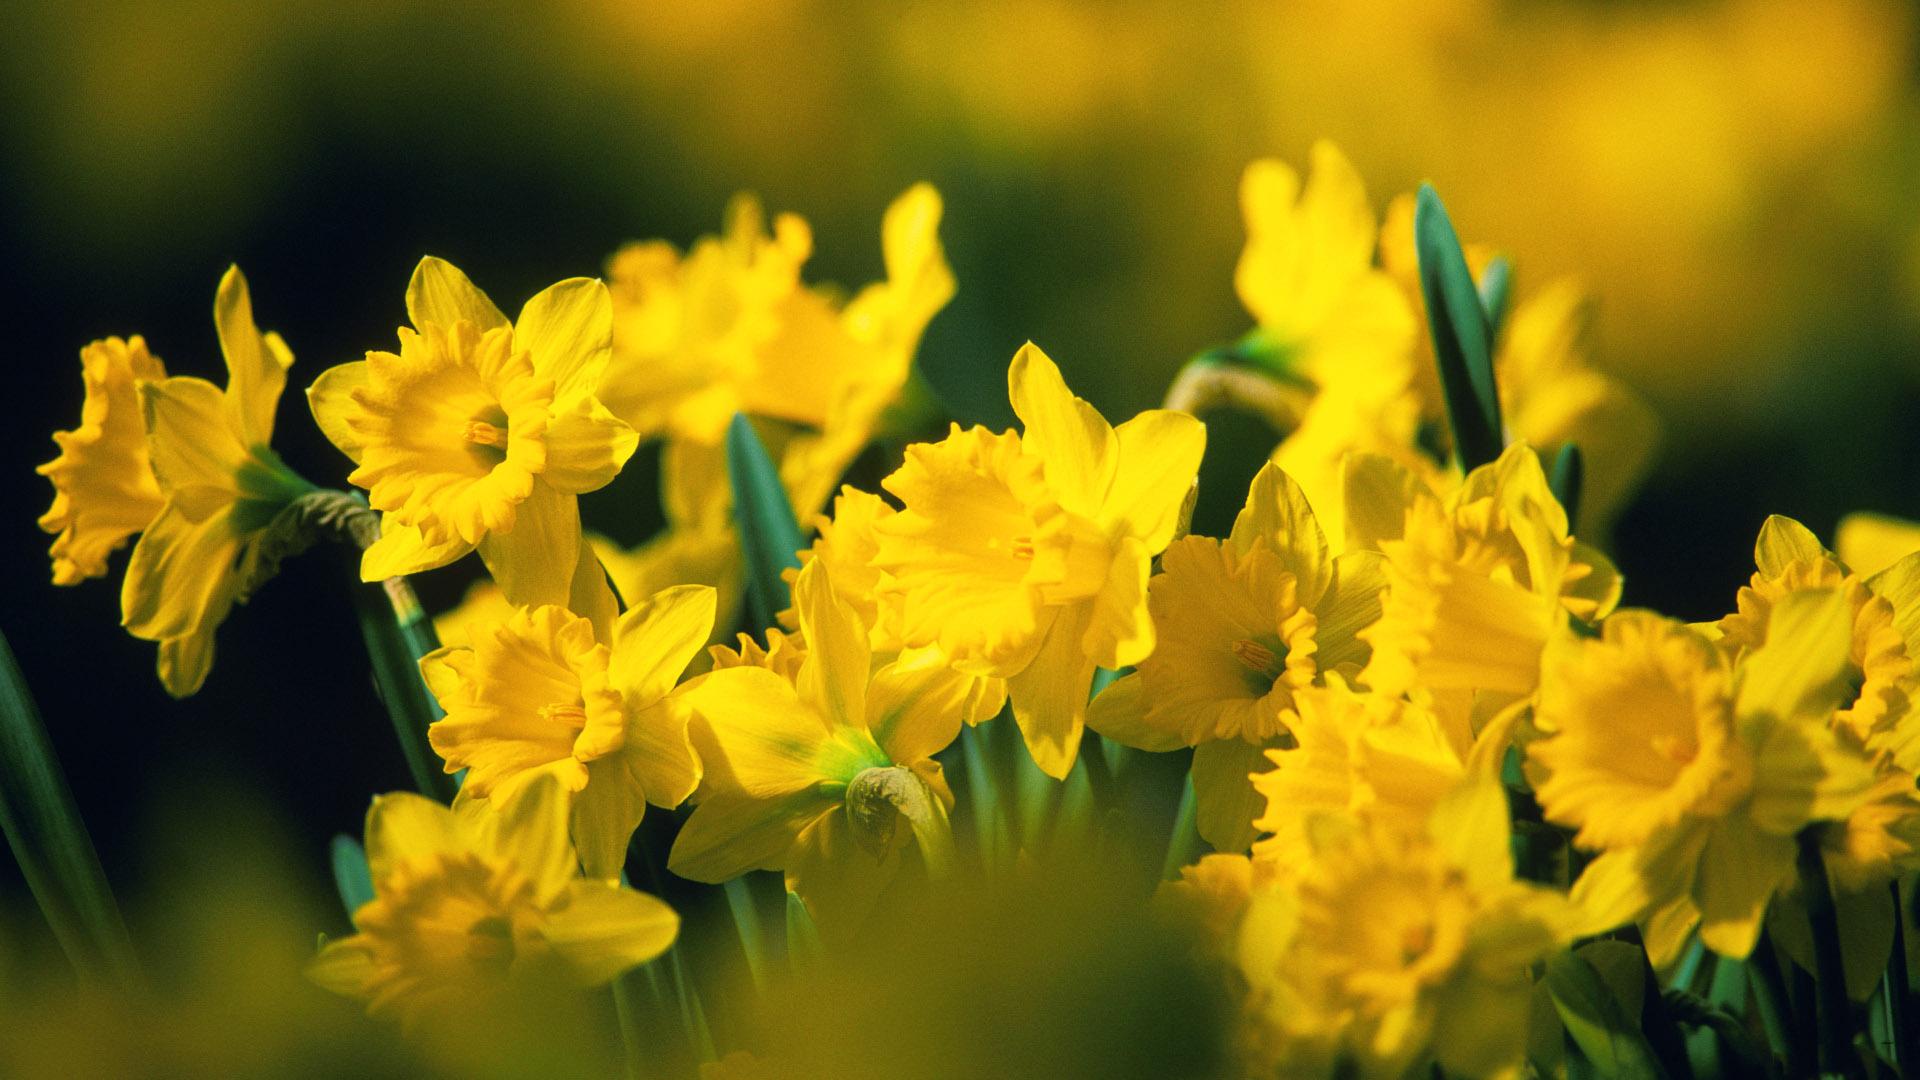 1920x1080px yellow flowers wallpaper wallpapersafari yellow flowers wallpaper mightylinksfo